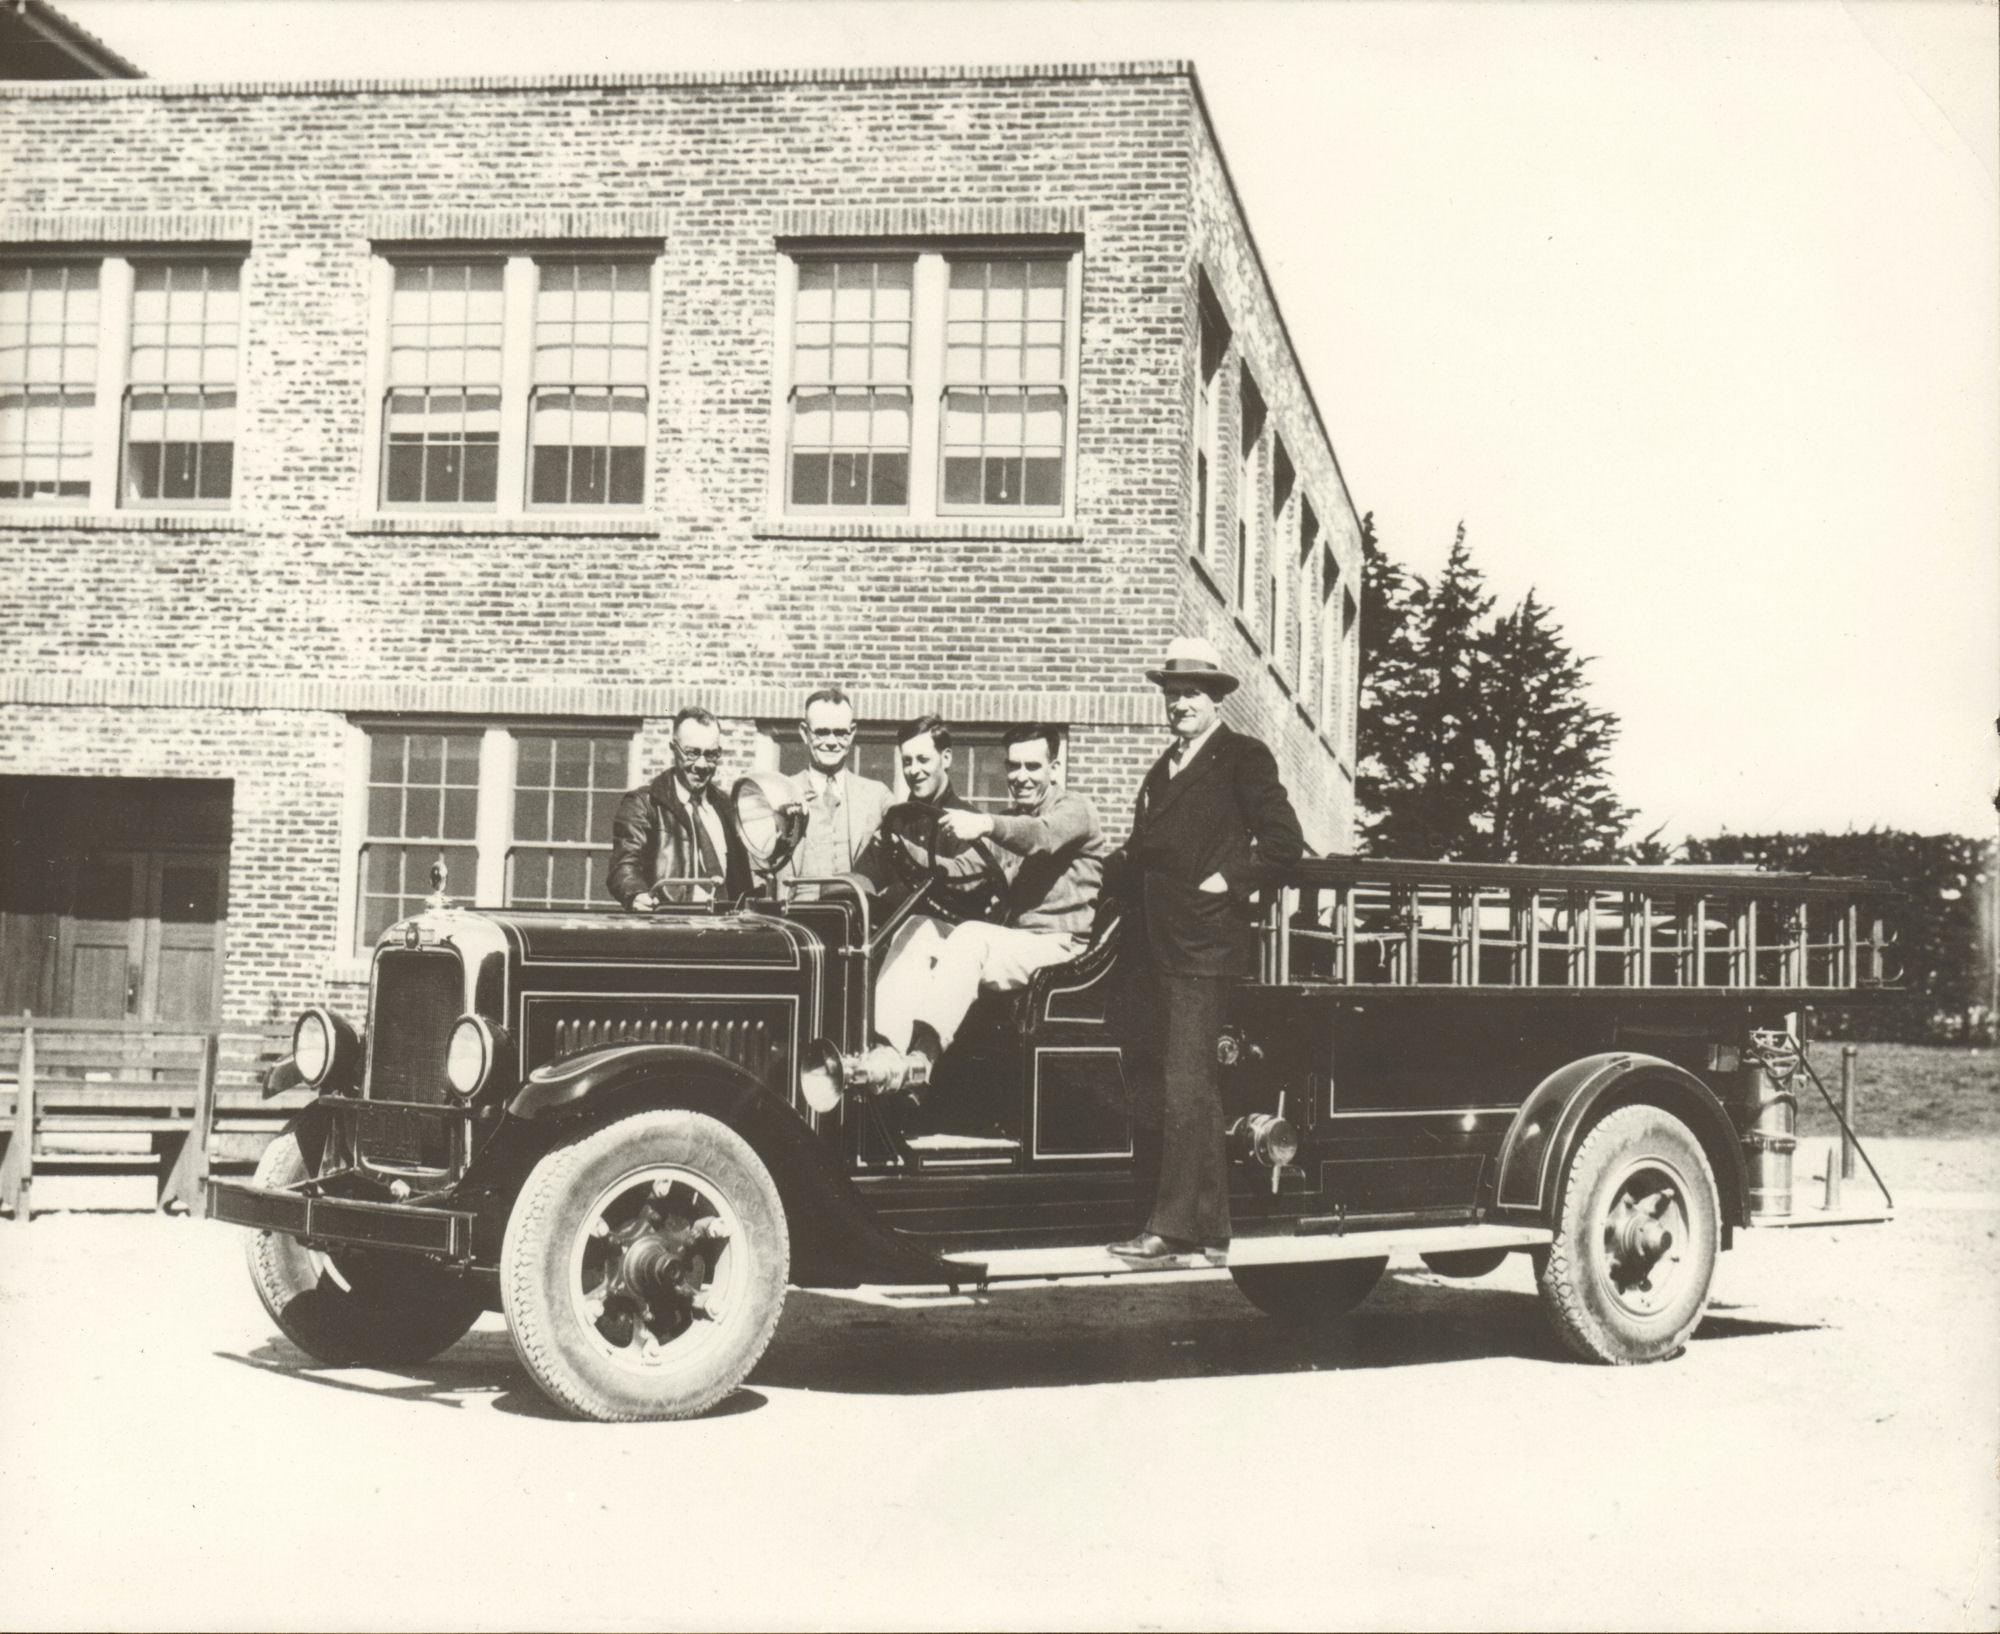 Old photo of people on a vintage engine